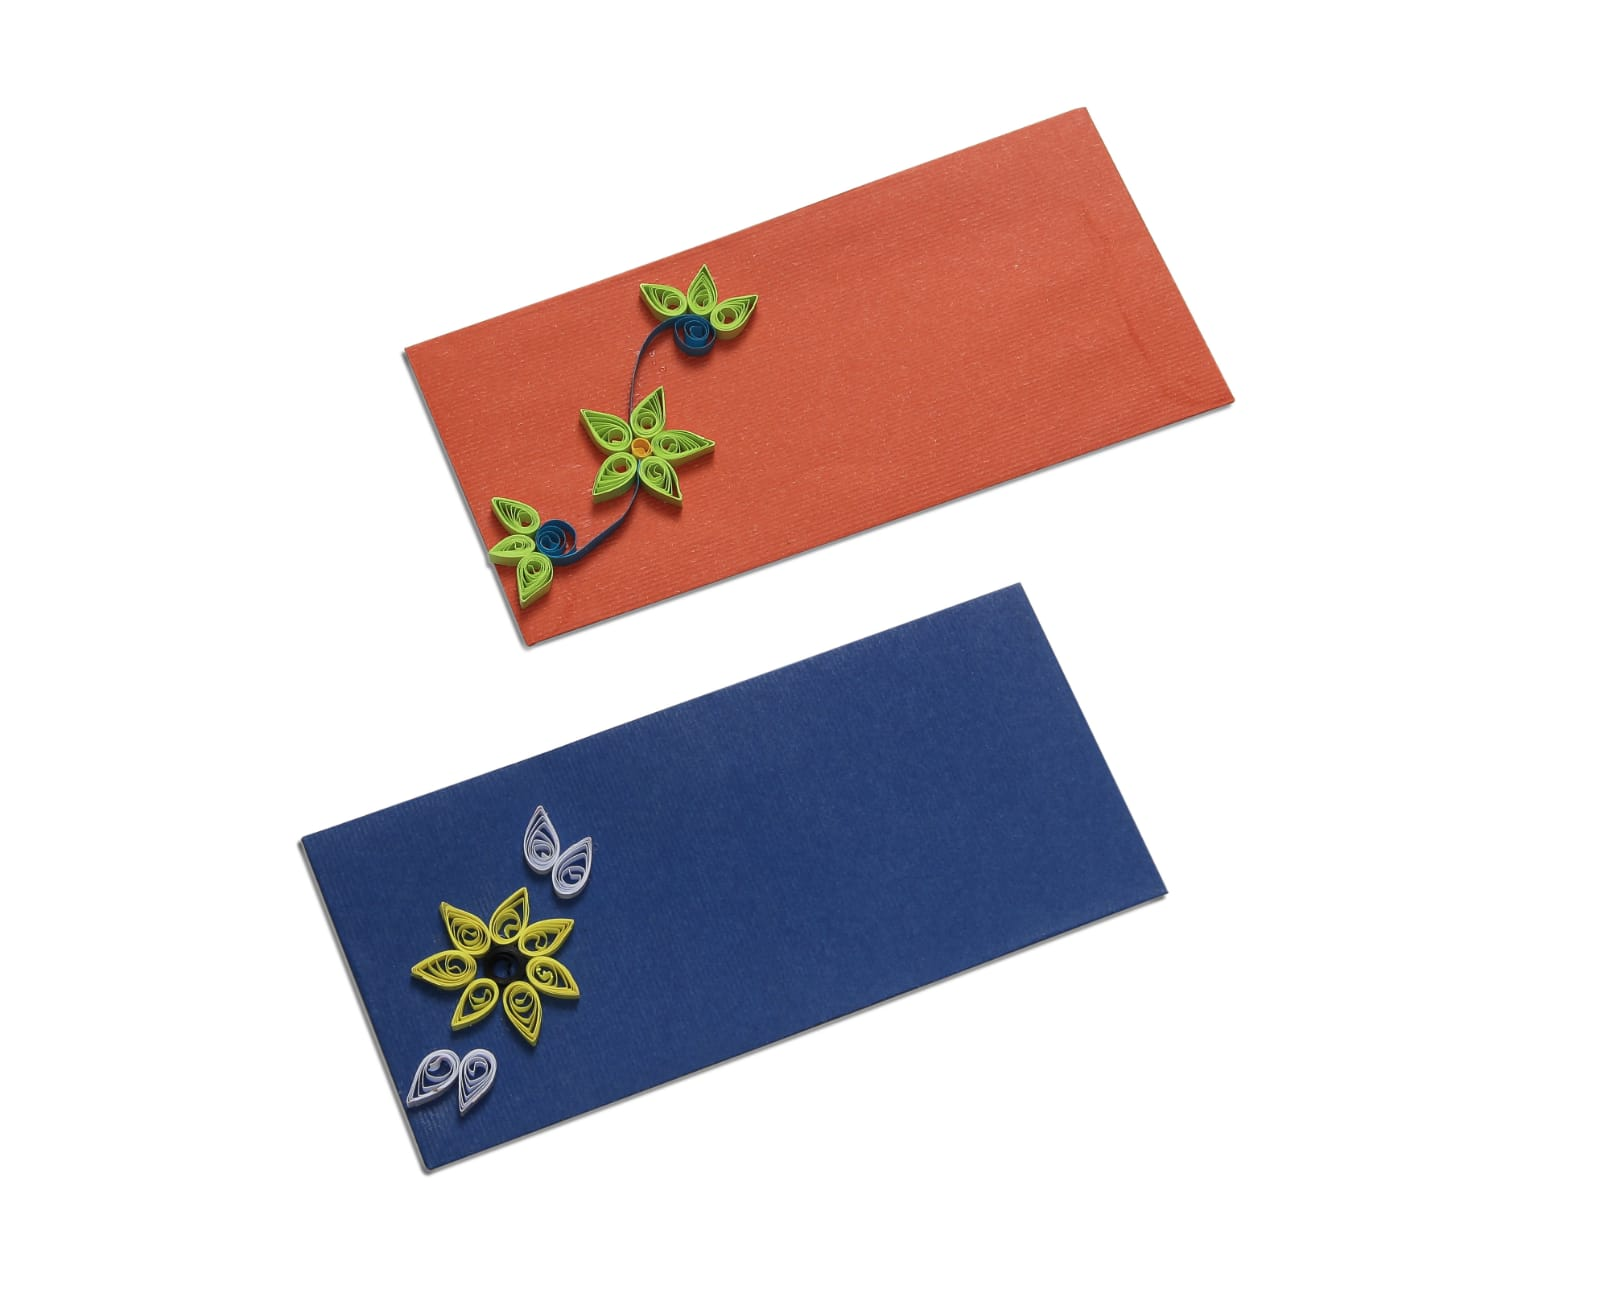 Assorted Quilling Gift Envelope (pack of 10) Slider Thumbnail 2/3